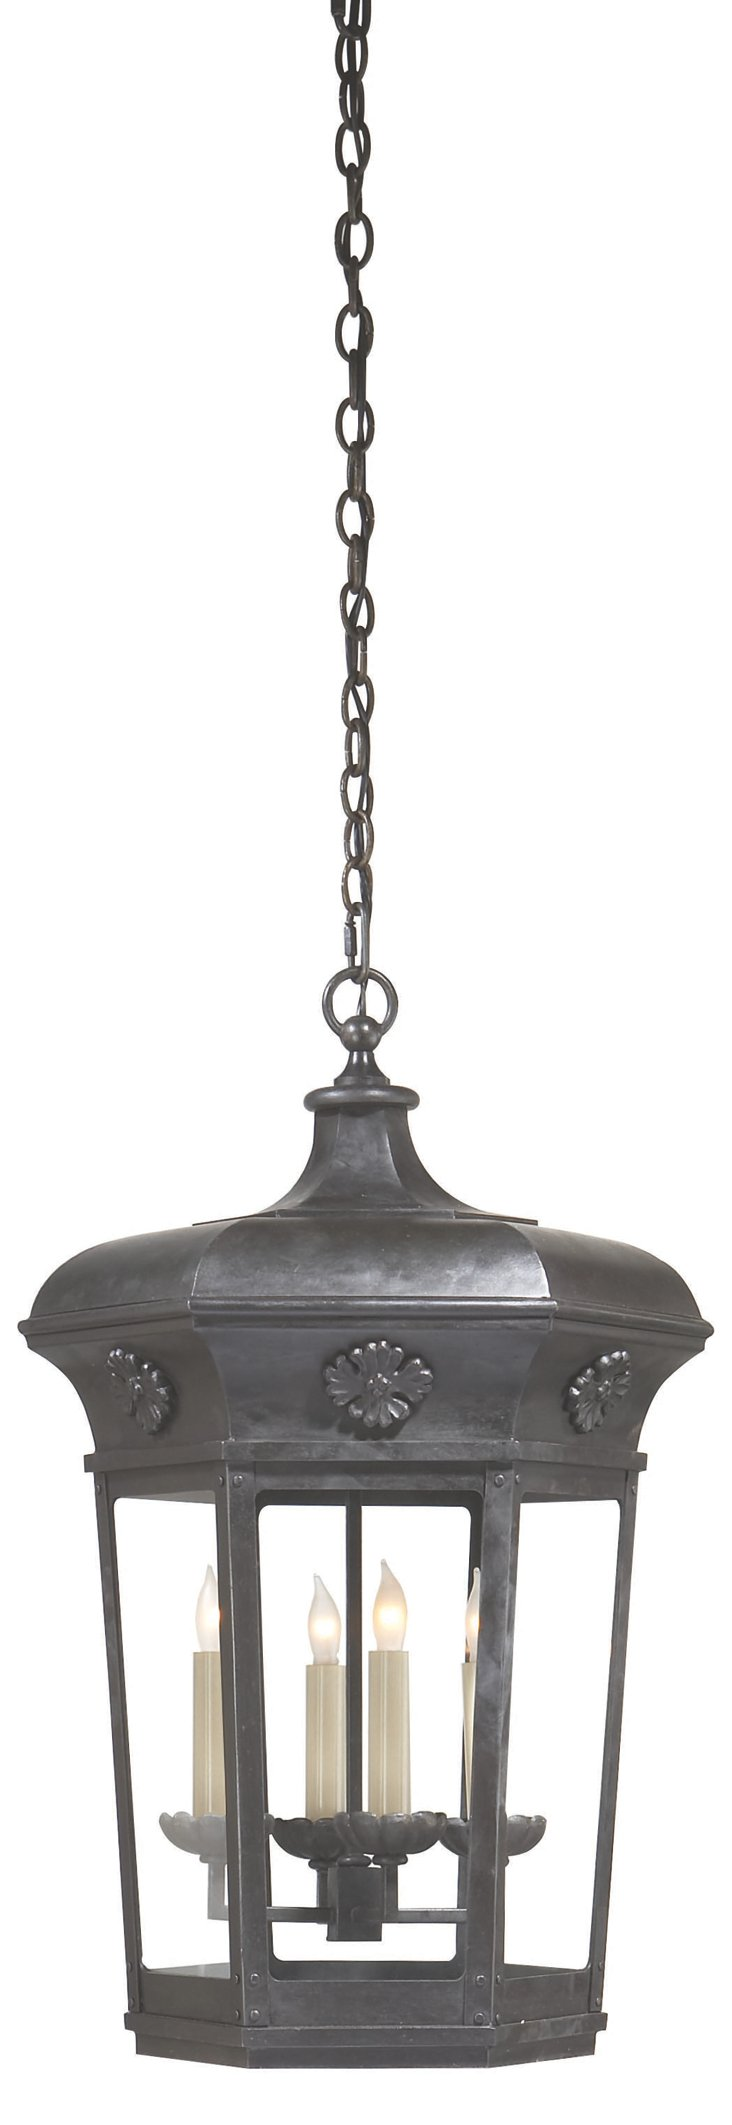 Delville 4-Light Hanging Lantern, Iron